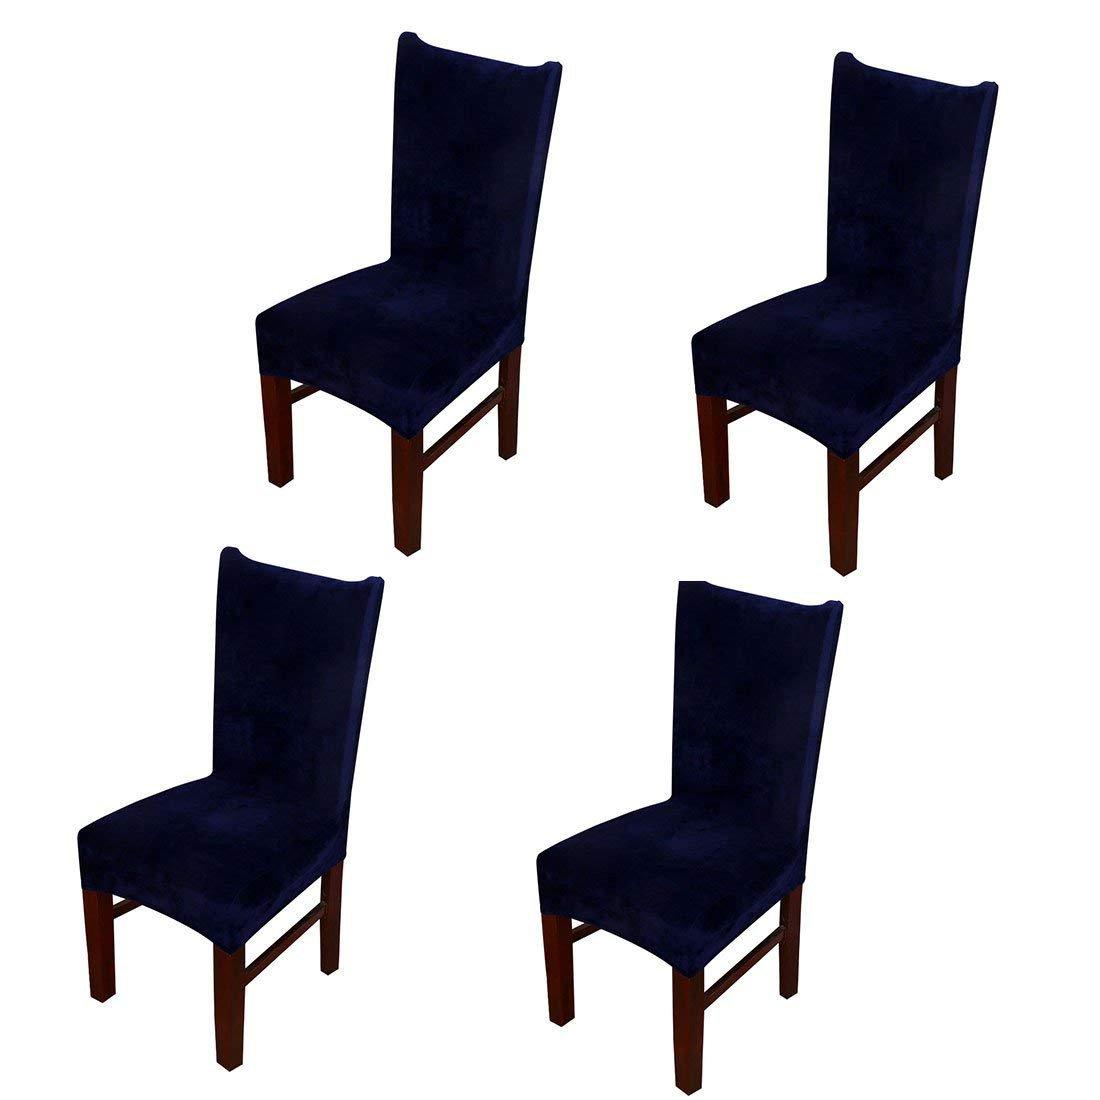 Pinjiストレッチ椅子カバー厚み付けリムーバブルShortダイニングルームプロテクターSeat Slipcover 4Pcs JC0663-5*4/PJUS 4Pcs ネイビーブルー B0761LRZRF